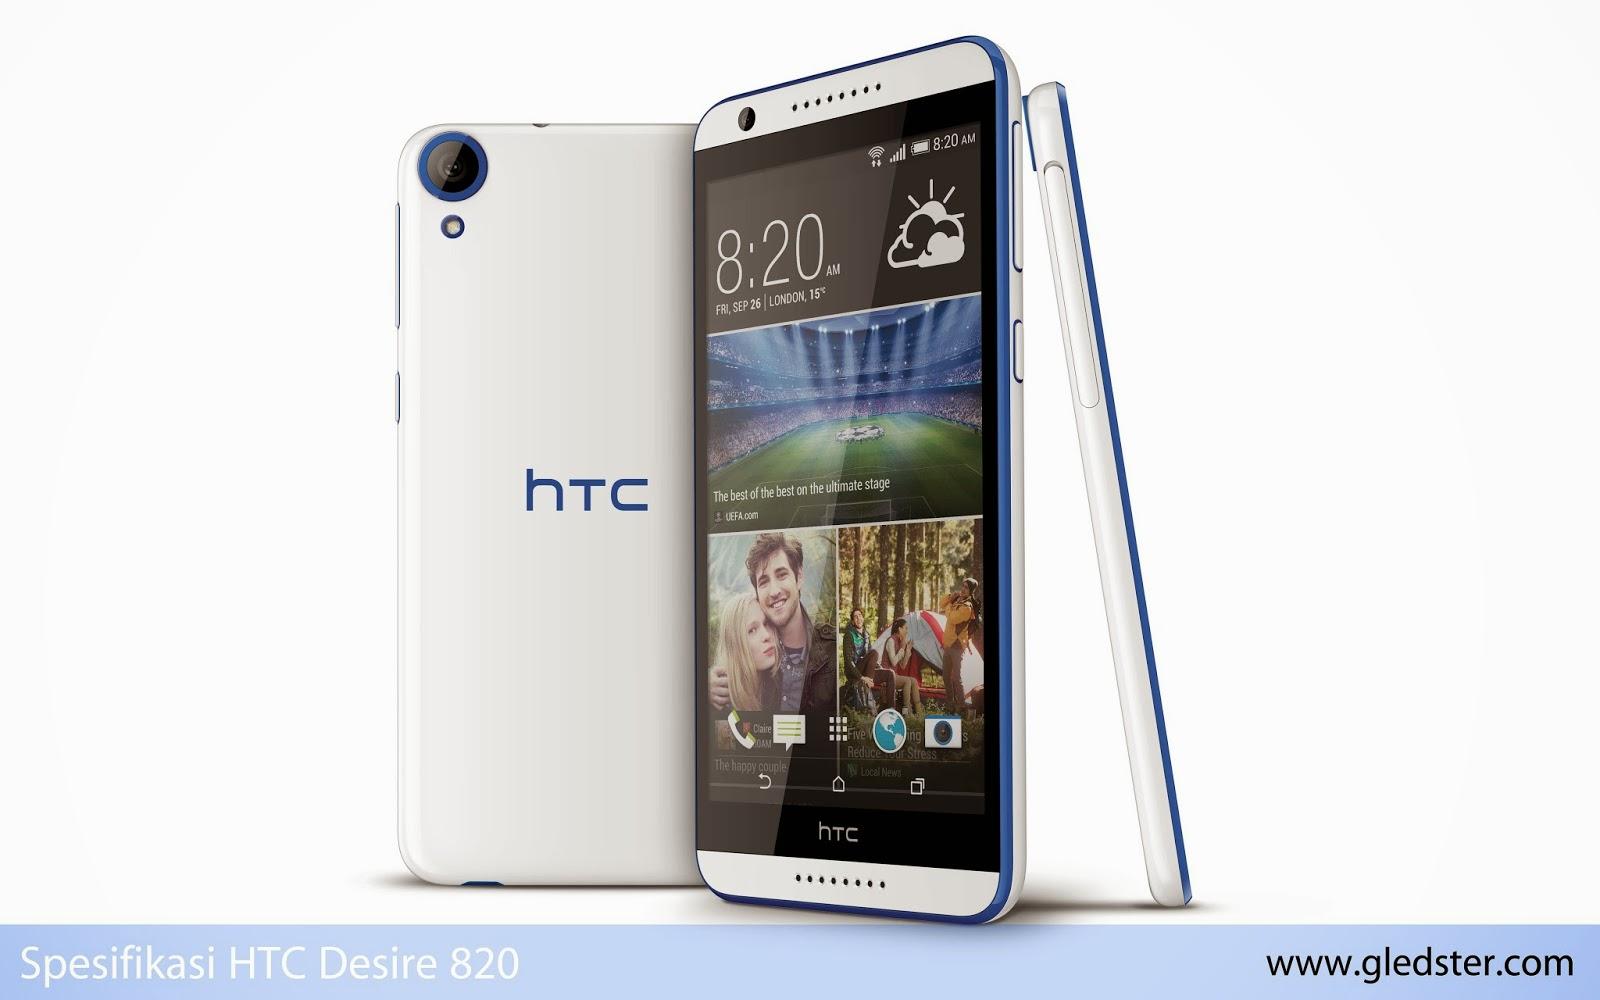 Spesifikasi HTC Desire 820